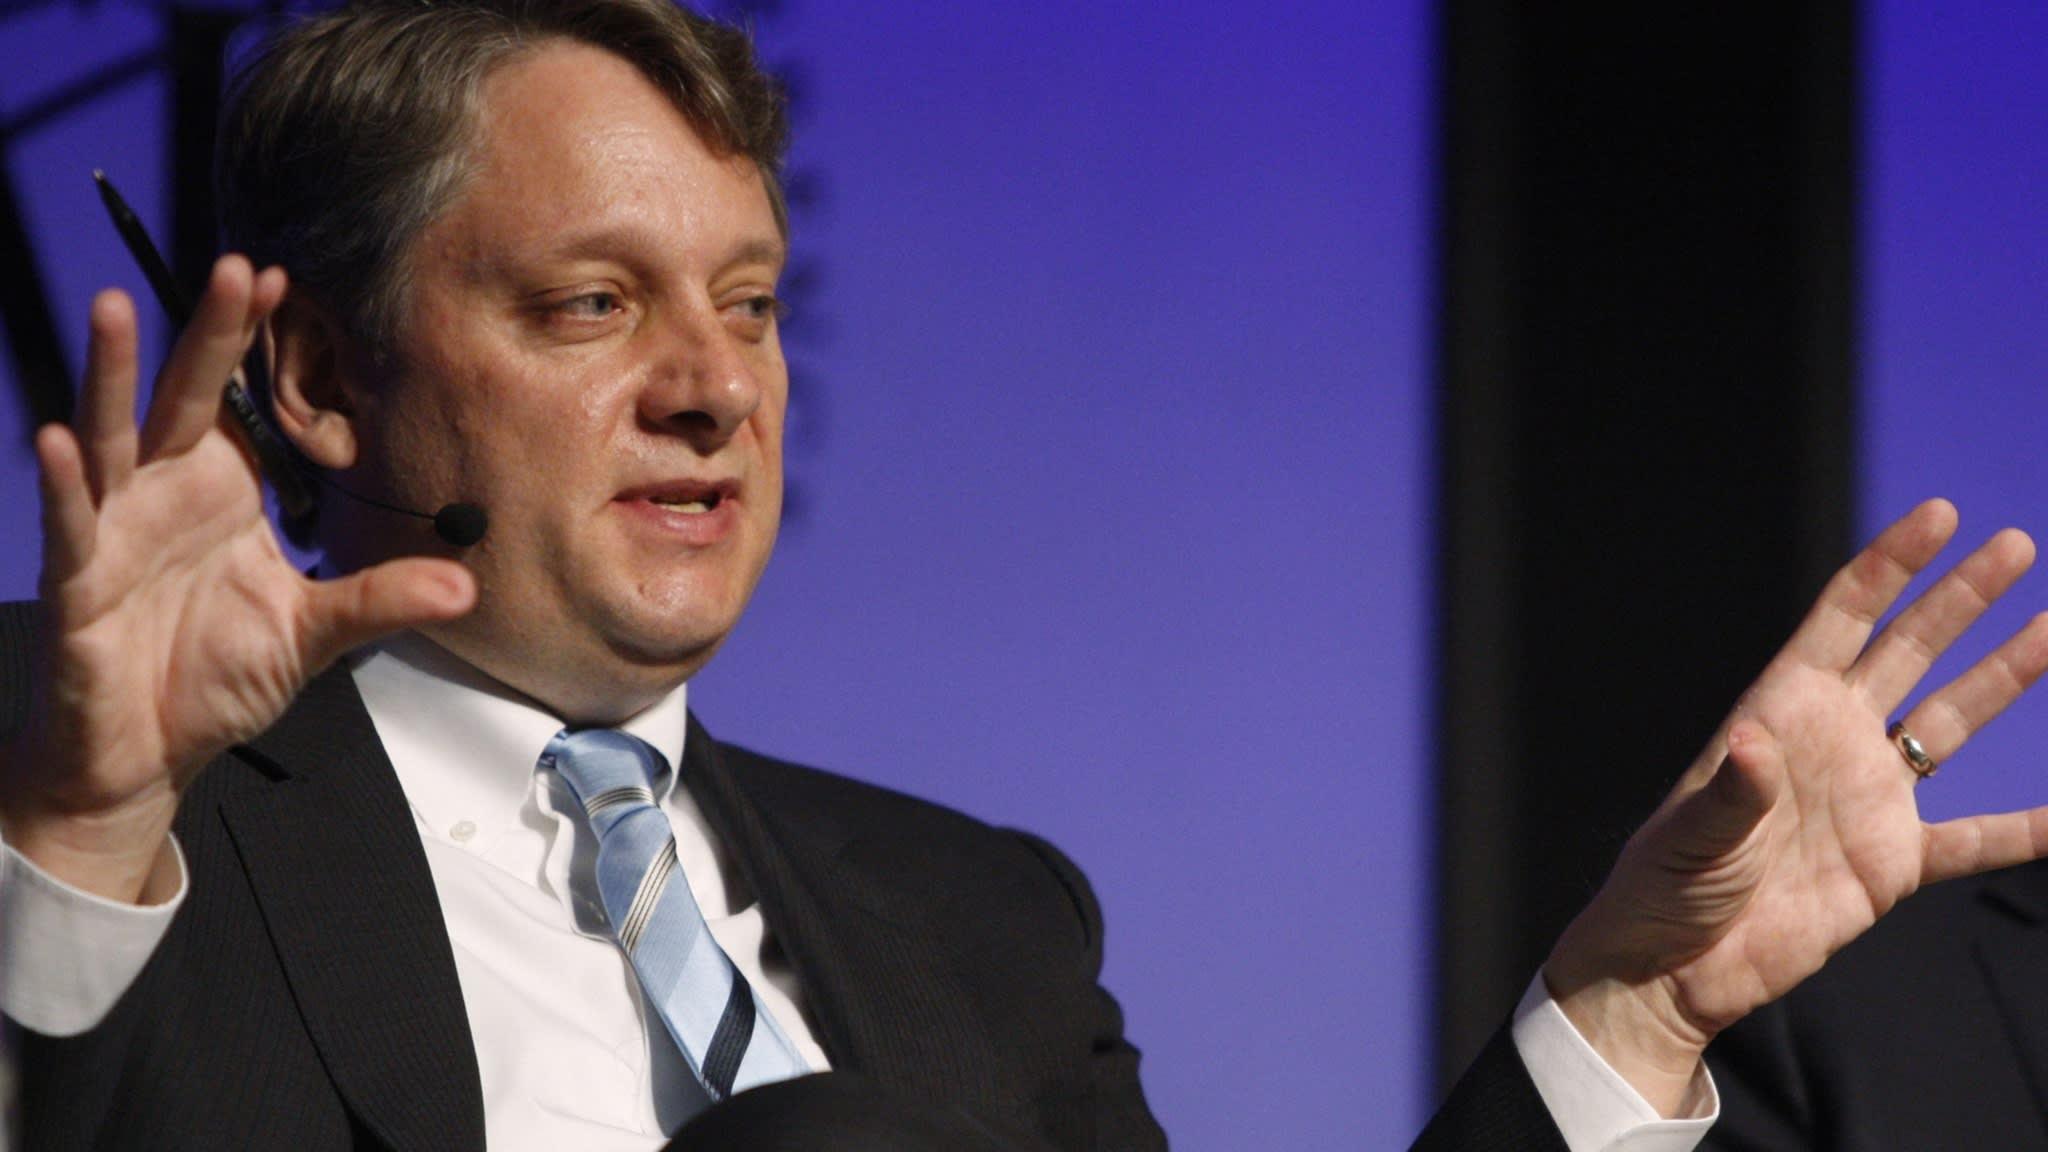 Pimco's CIO strikes cautious tone on US corporate debt